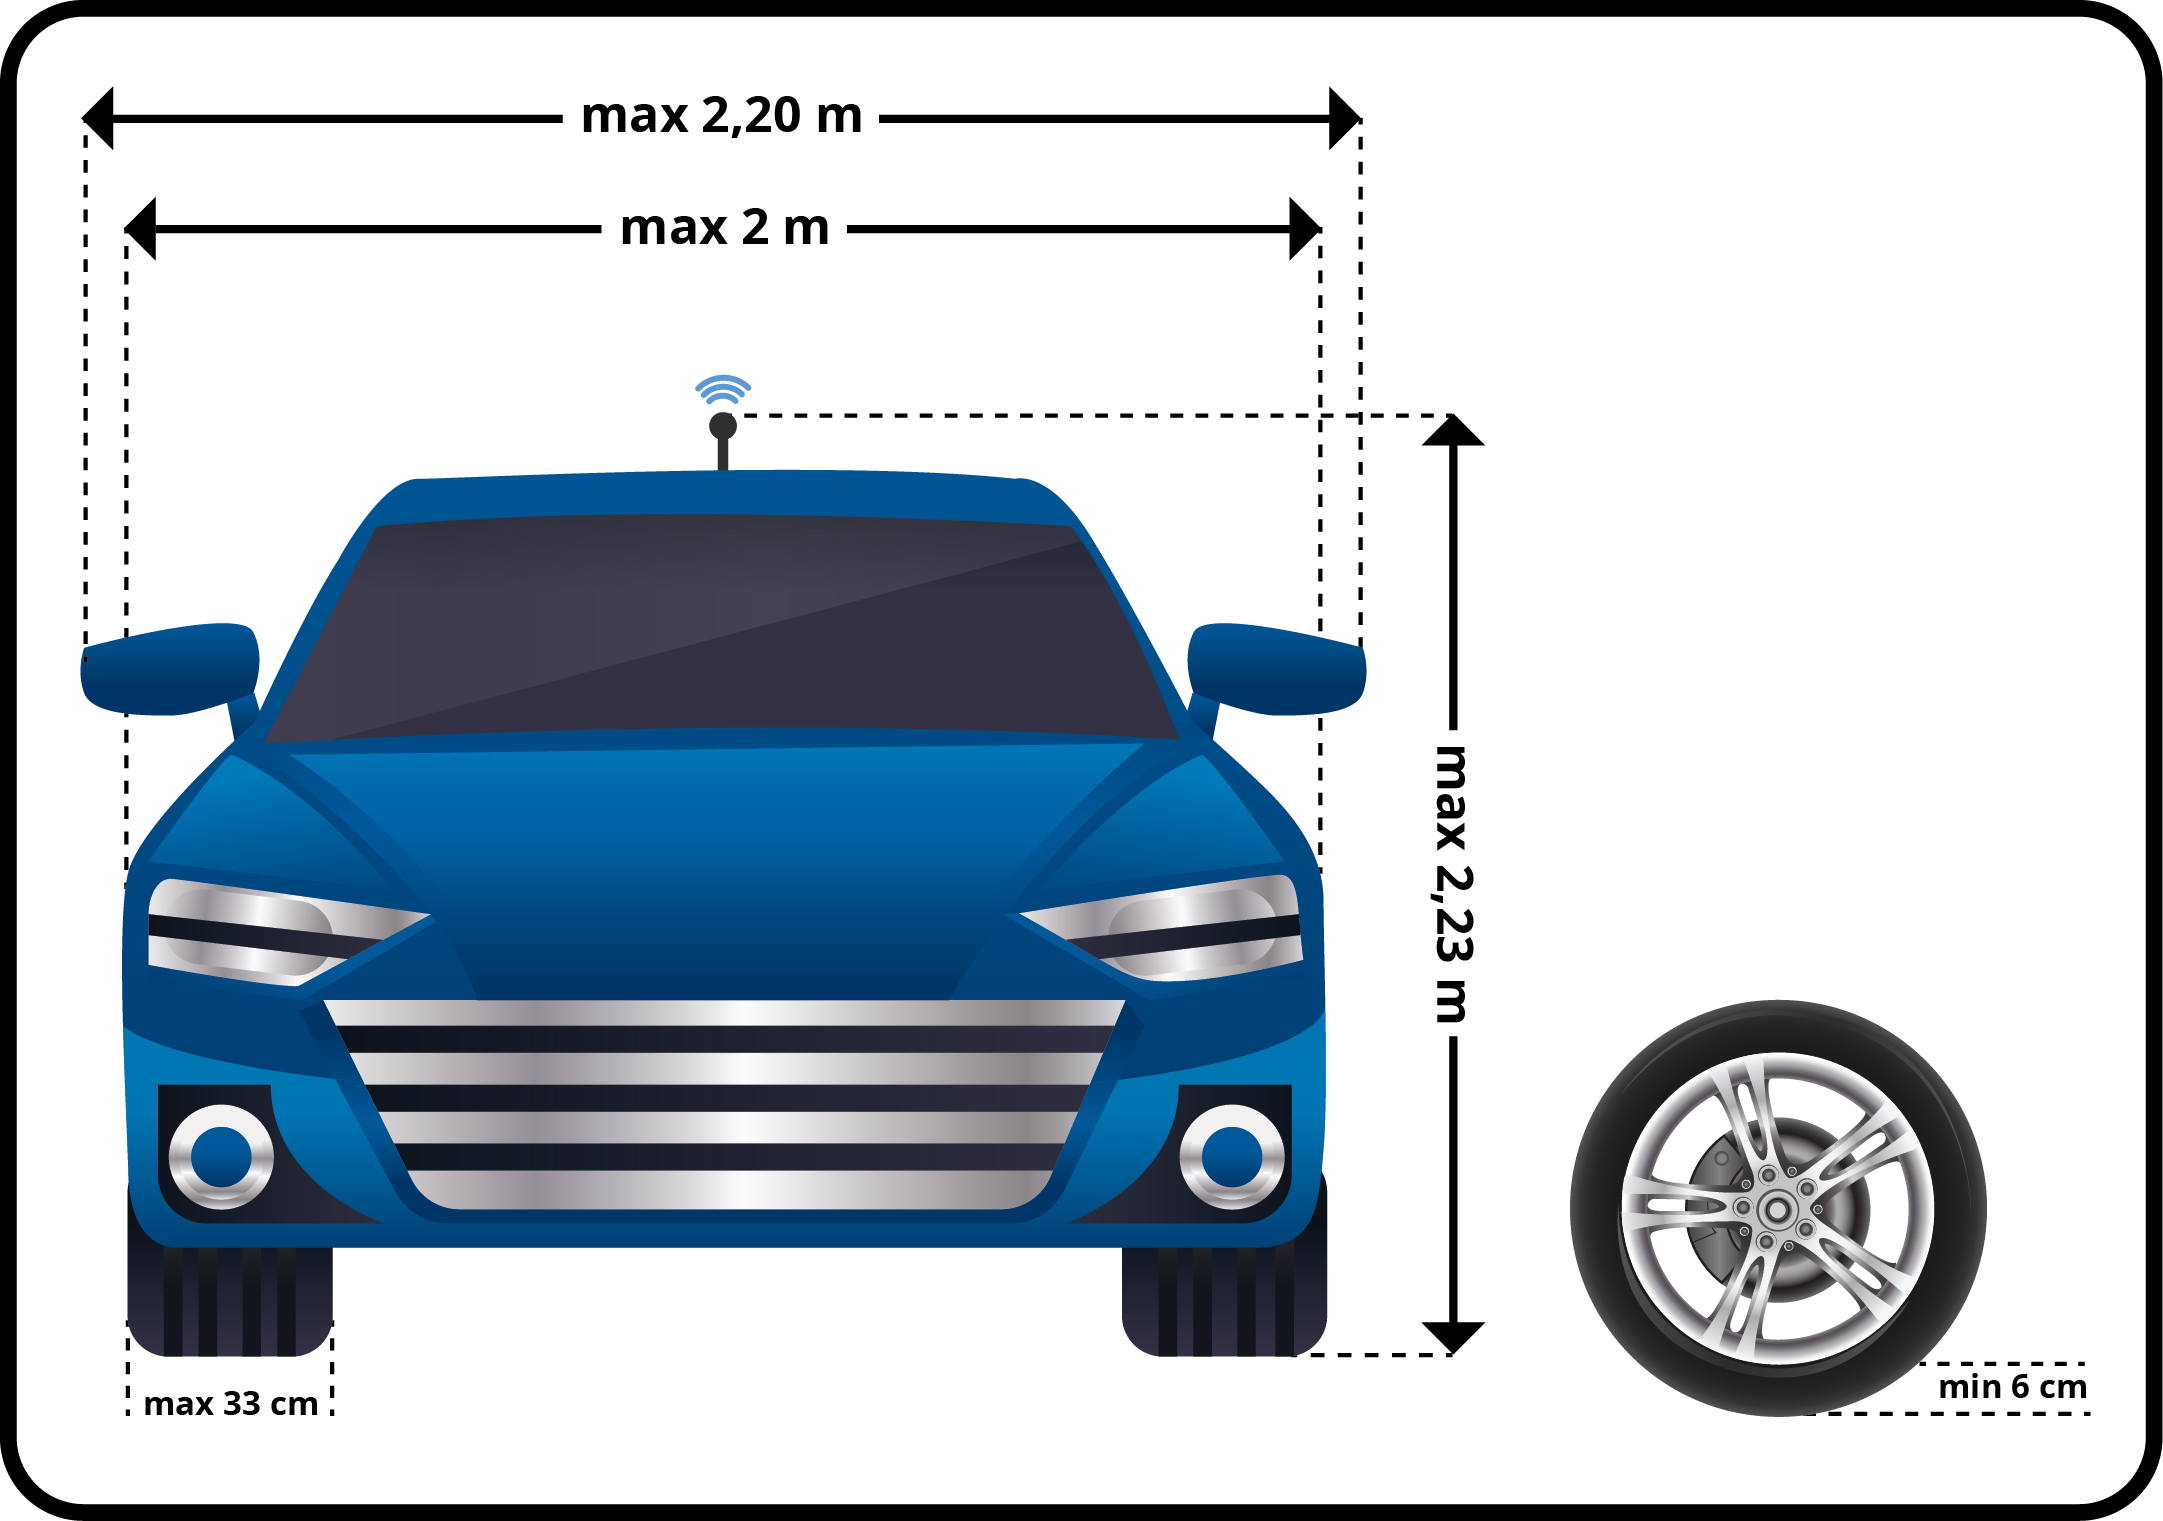 Dimensions_max_vehicule